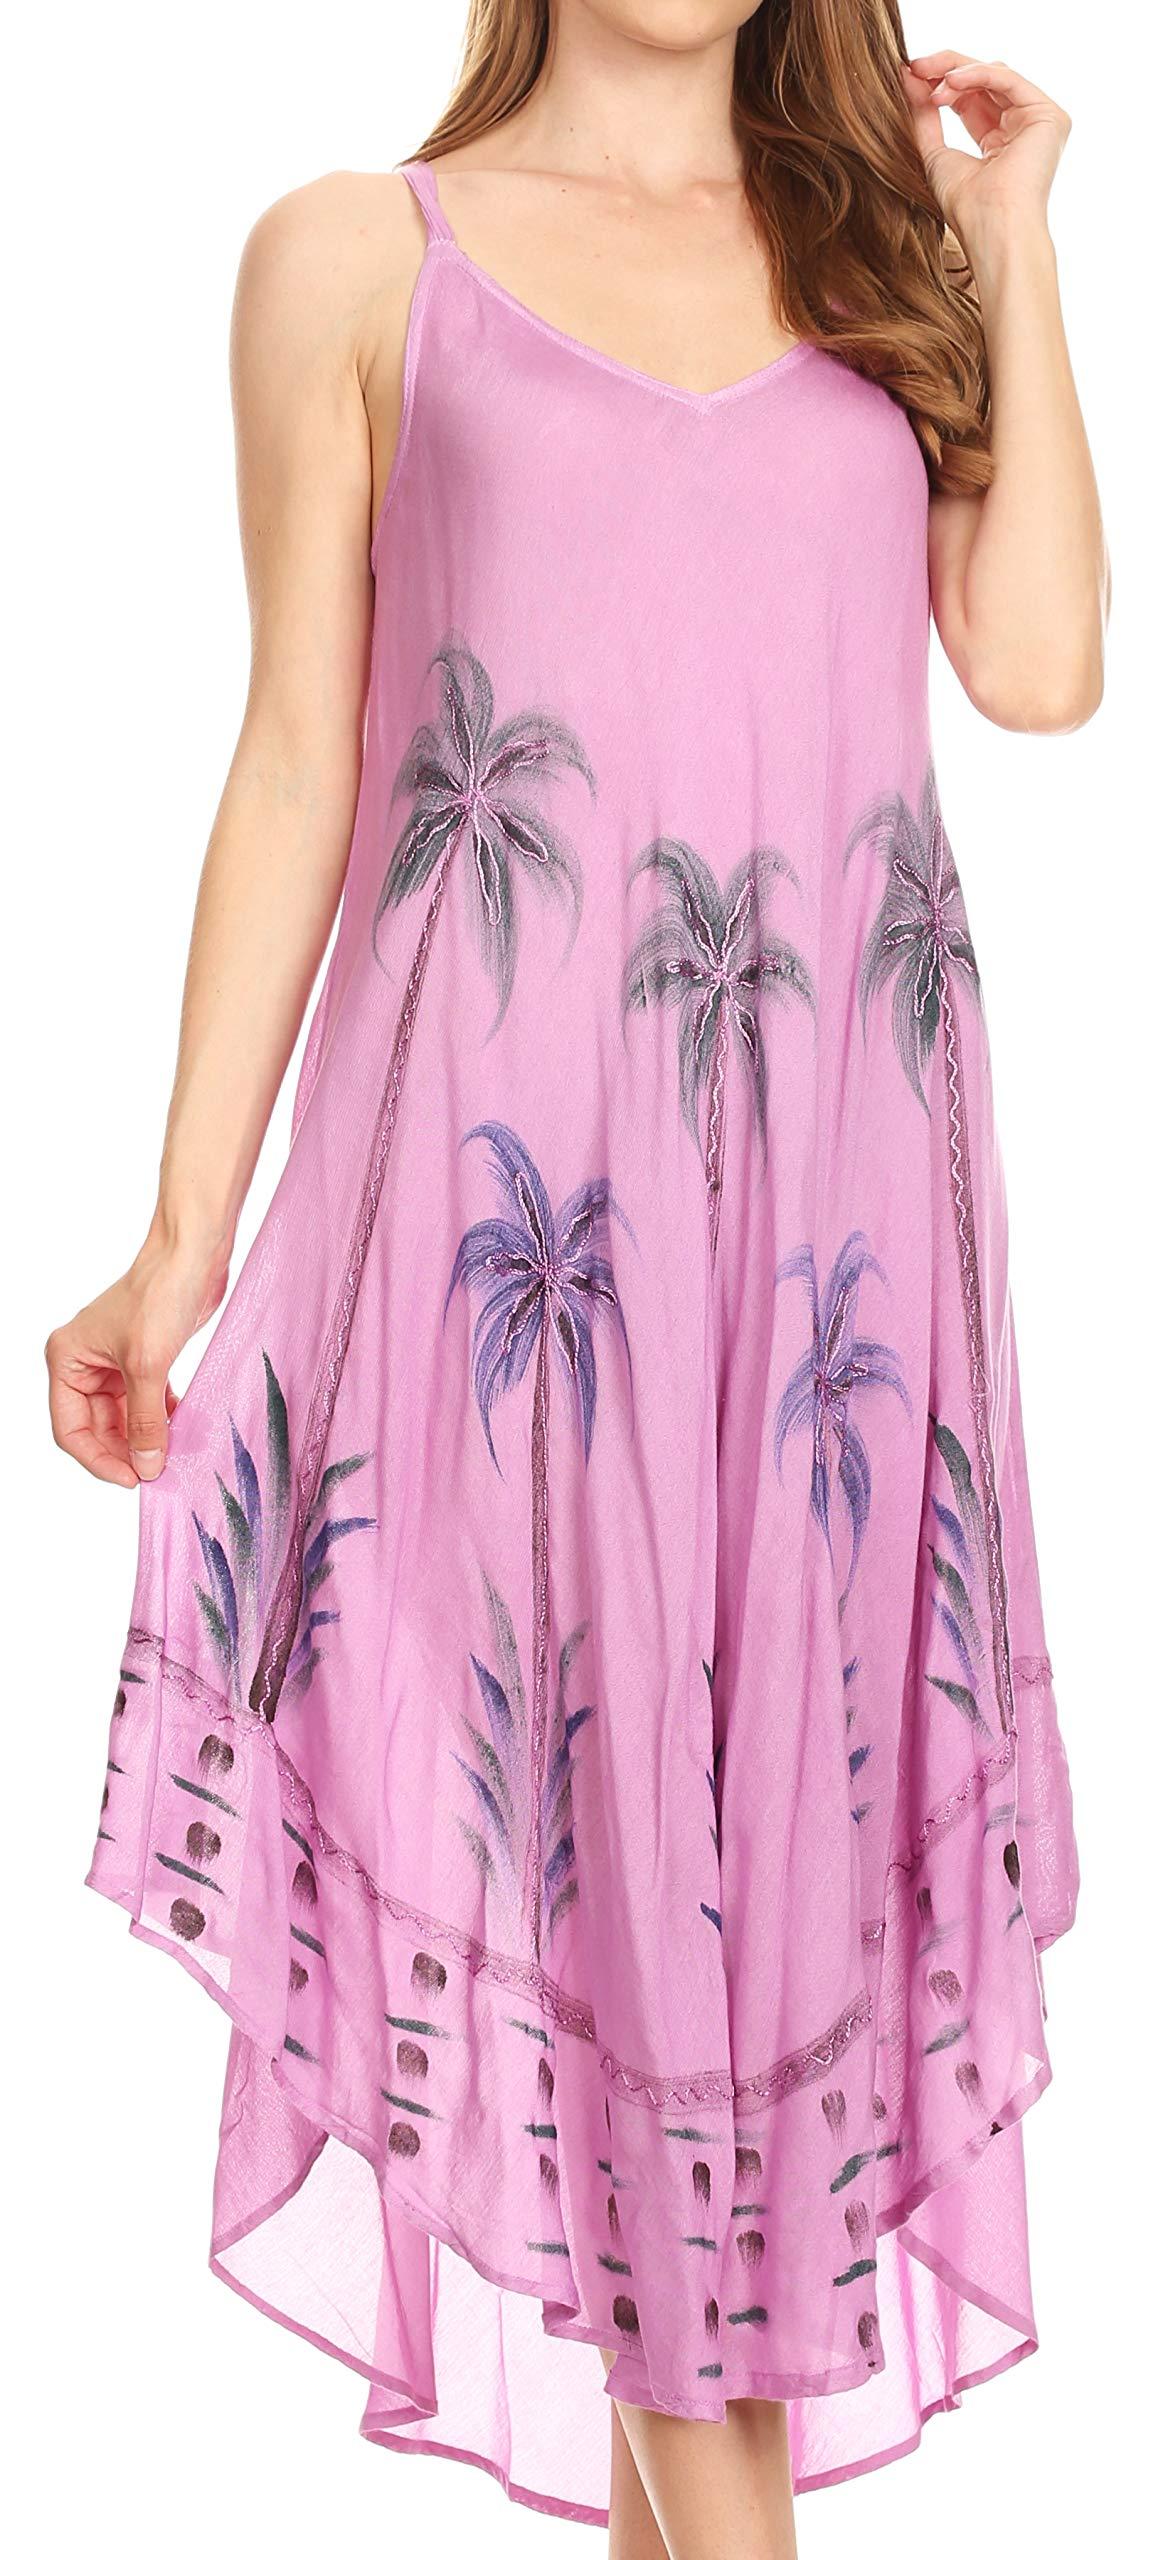 Sakkas 19333 - Nila Women's Double Spaghetti Strap V-Neck Casual Maxi Long Summer Dress - Purple - OS